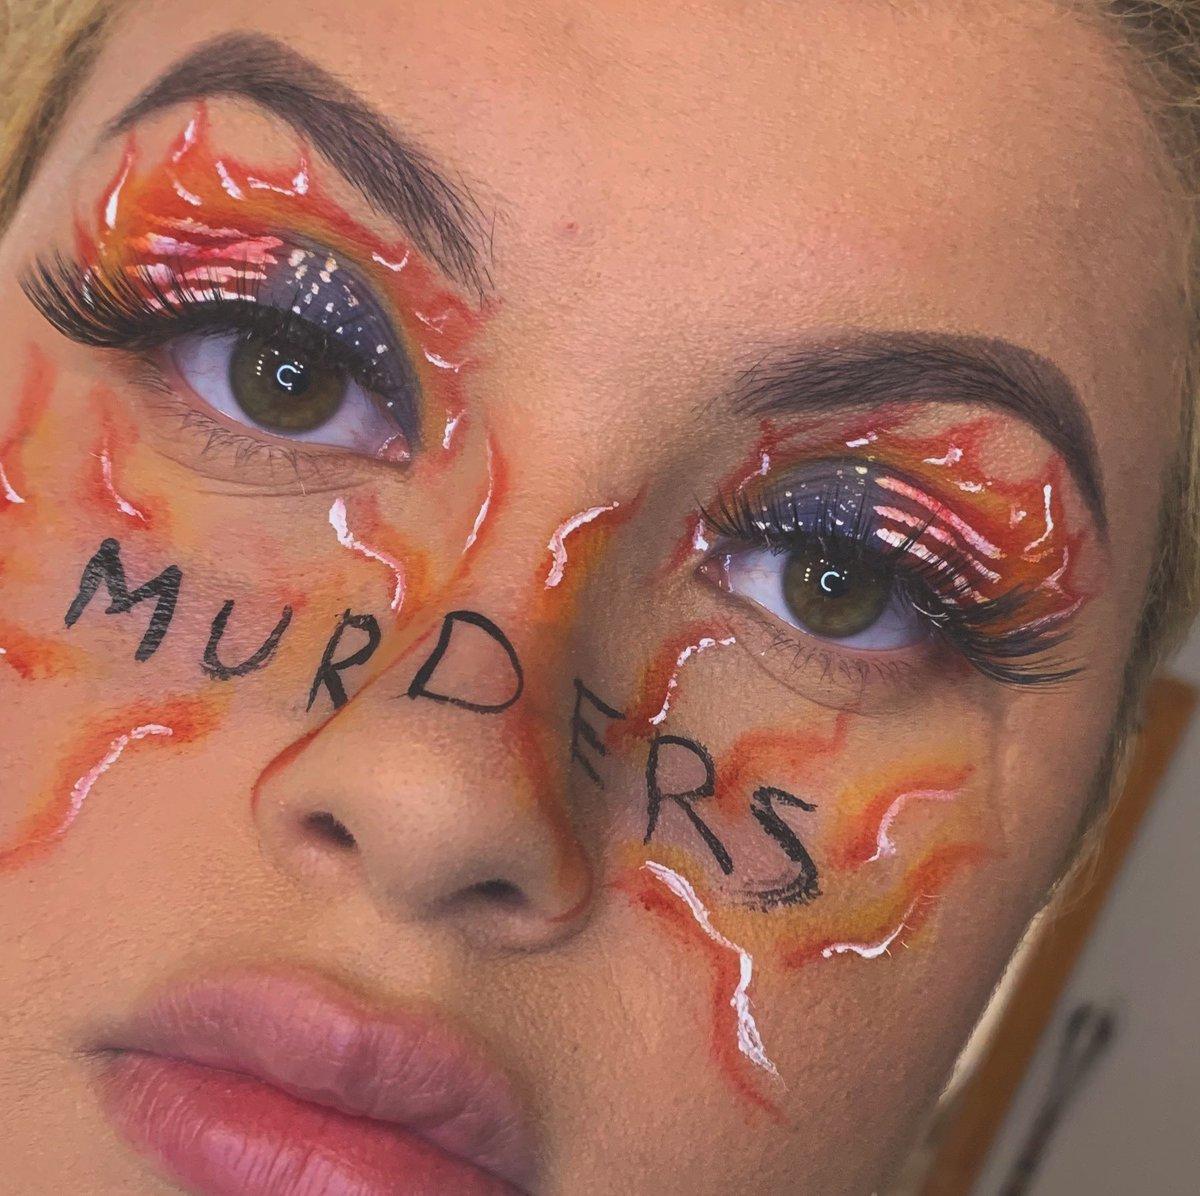 #morphebabe #unleashyourinnerartist #lashes #rainbowlook #anastiabeverlyhills #eyeshadow #beatface #makeup #undiscovermuas #explorepage #blend #muasfeaturing  #jamescharlespalette ##colorfuleyeshadow  #eyeshadow #abhcosmetics #anastiabeverlyhills #racist #murderspic.twitter.com/NbssAW2O9Y